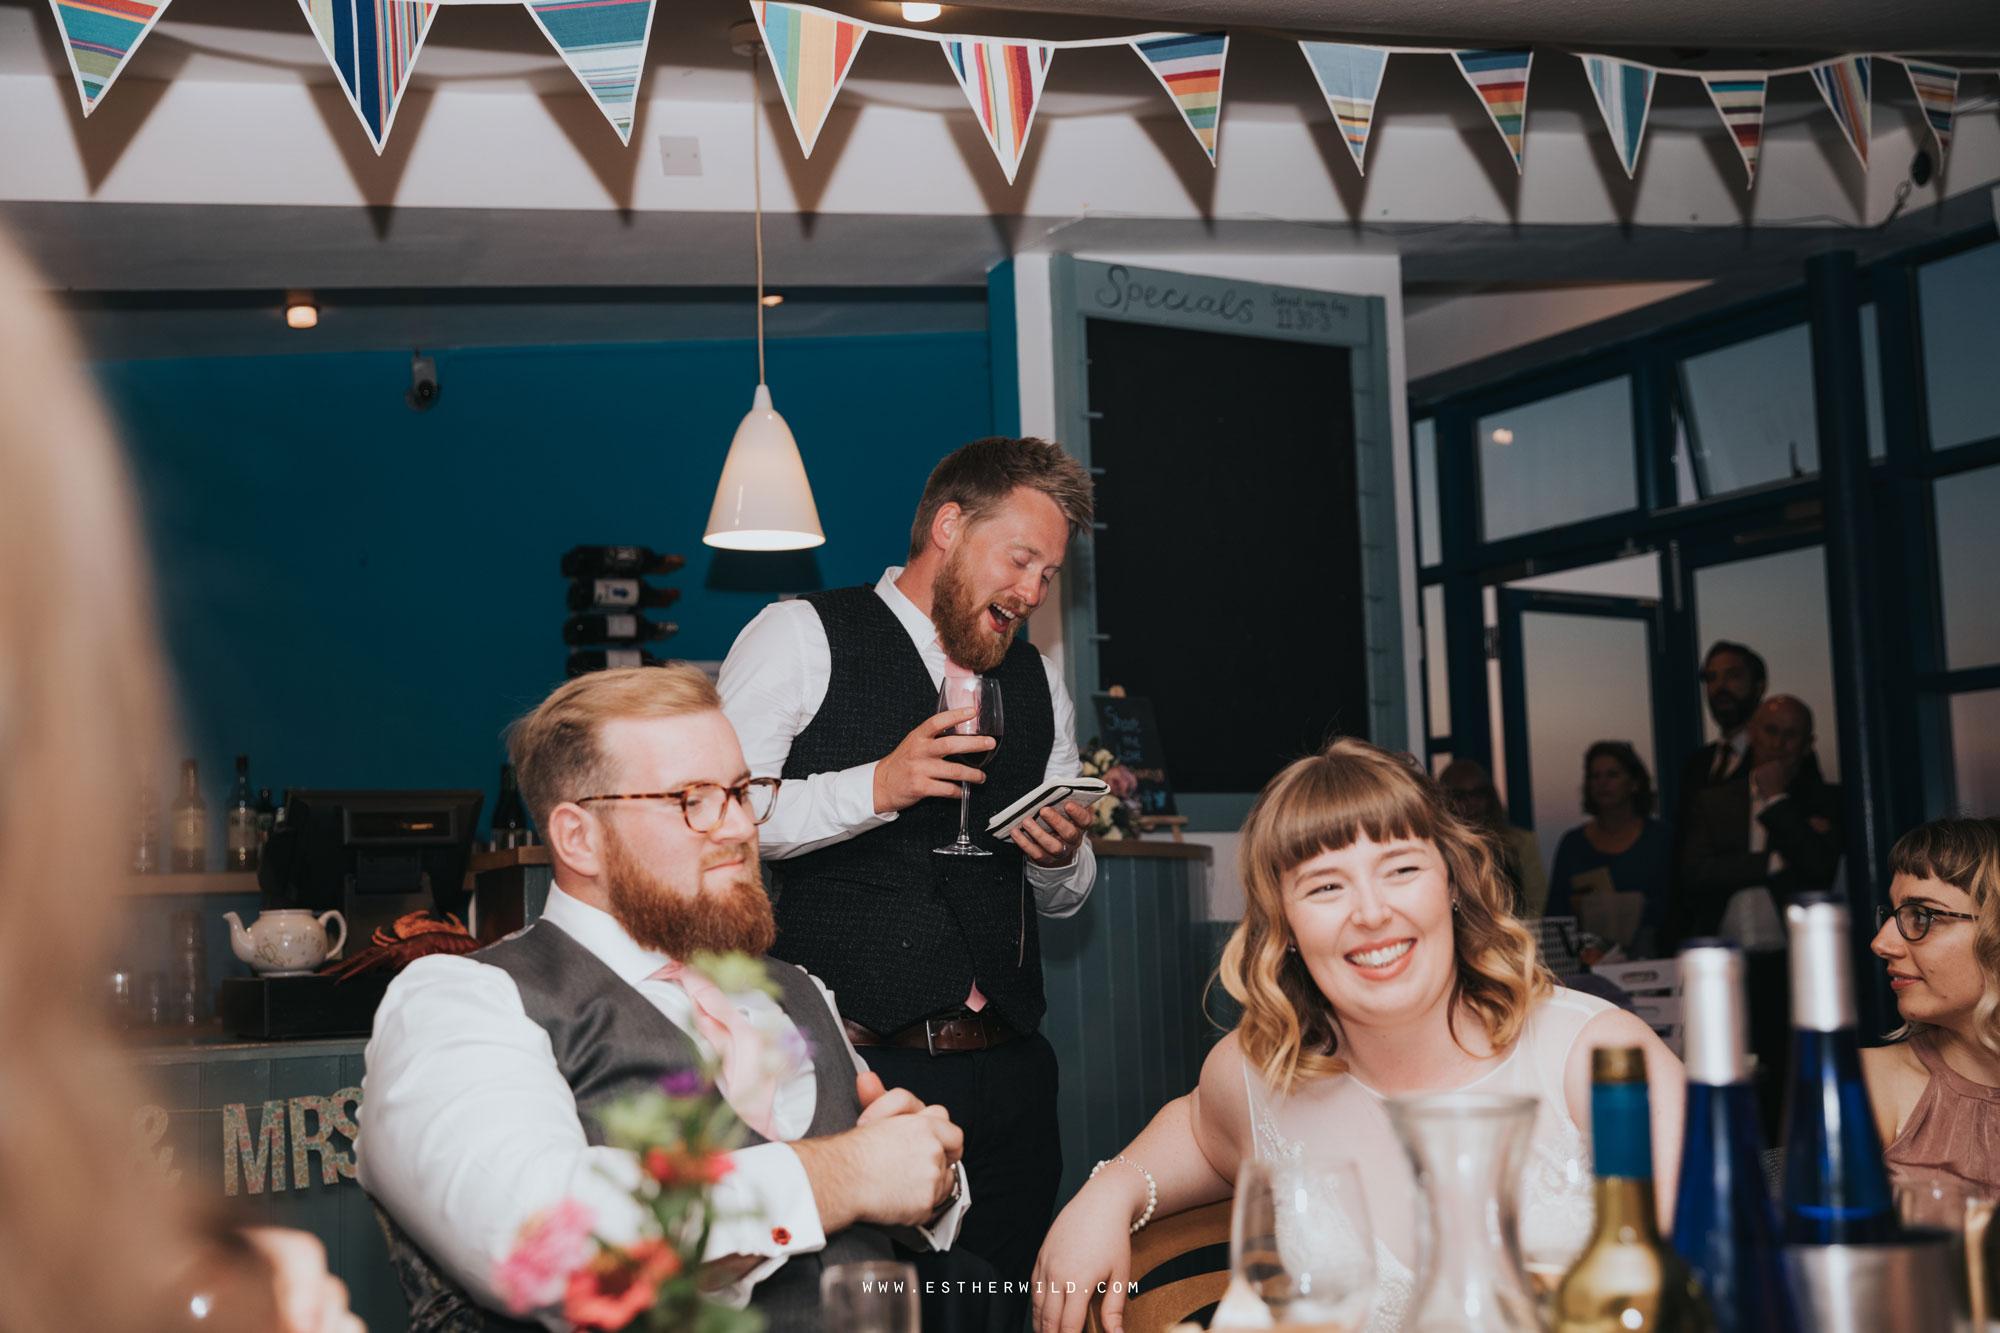 Cromer_Wedding_Beach_Outdoor_Ceremony_Norfolk_North_Lodge_Registry_Office_Rocket_House_Cafe_Cromer_Pier_IMG_5360.jpg